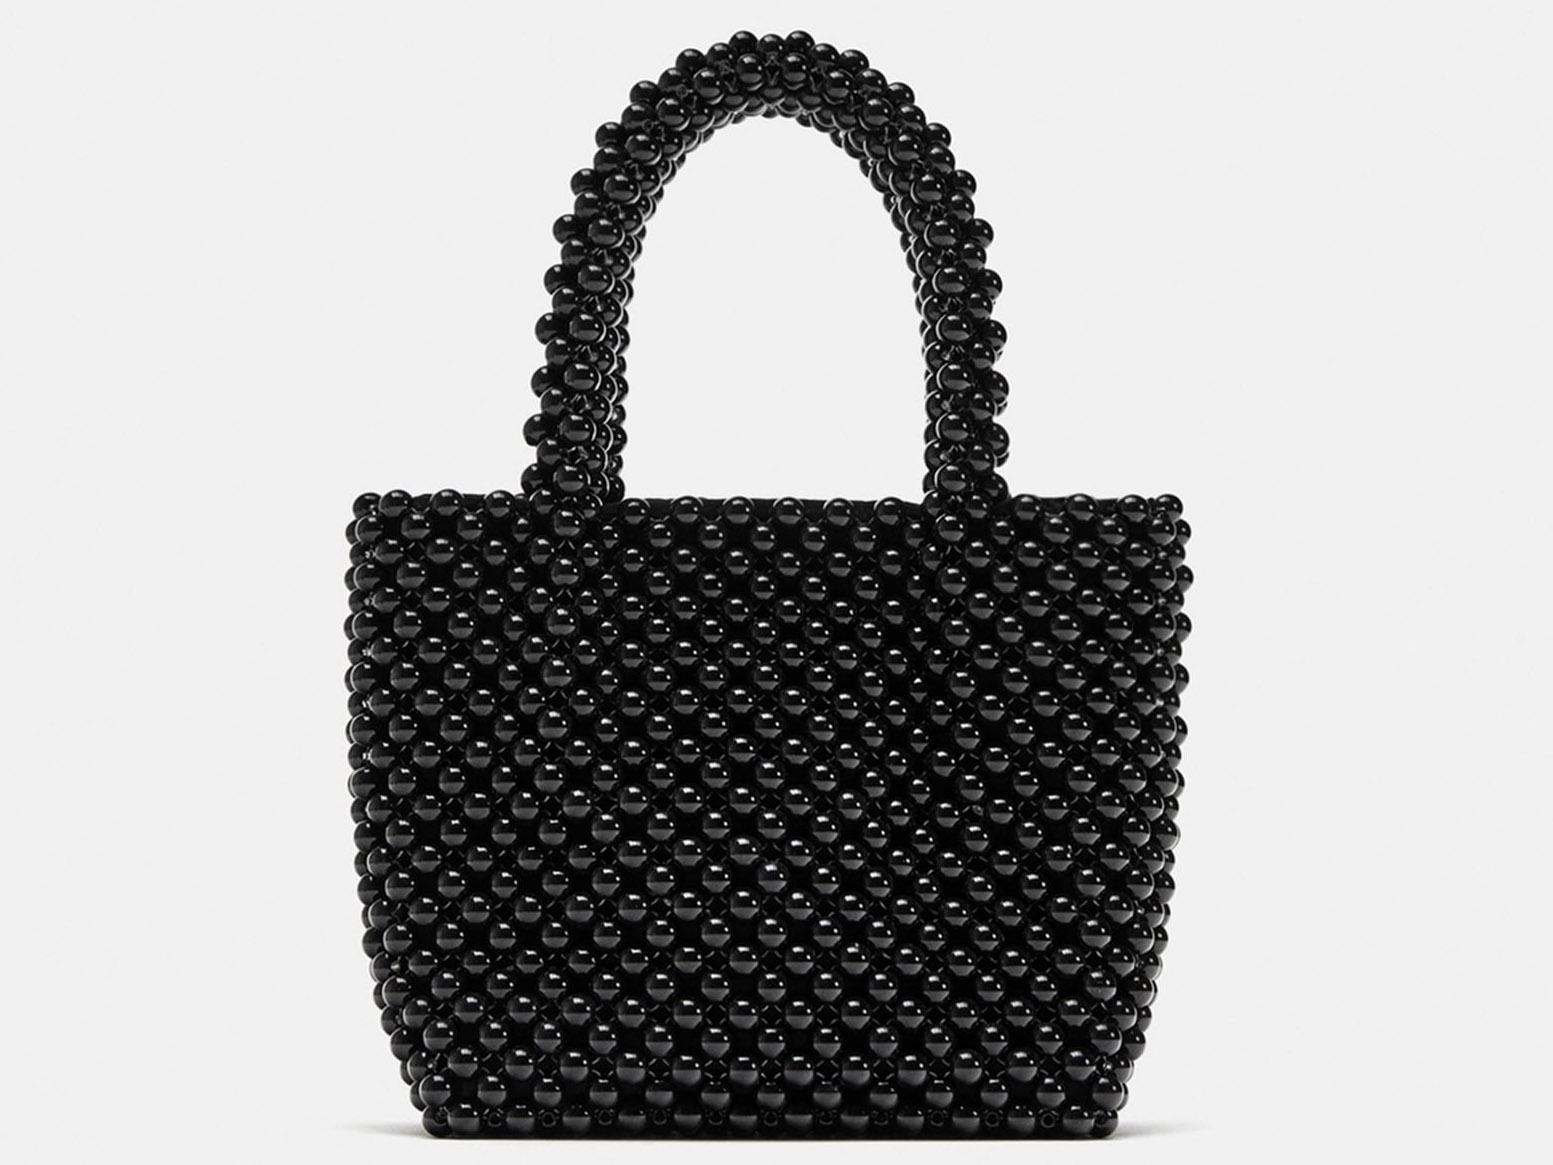 4c62f0cc0237c0 Zara Bags Uk Sale